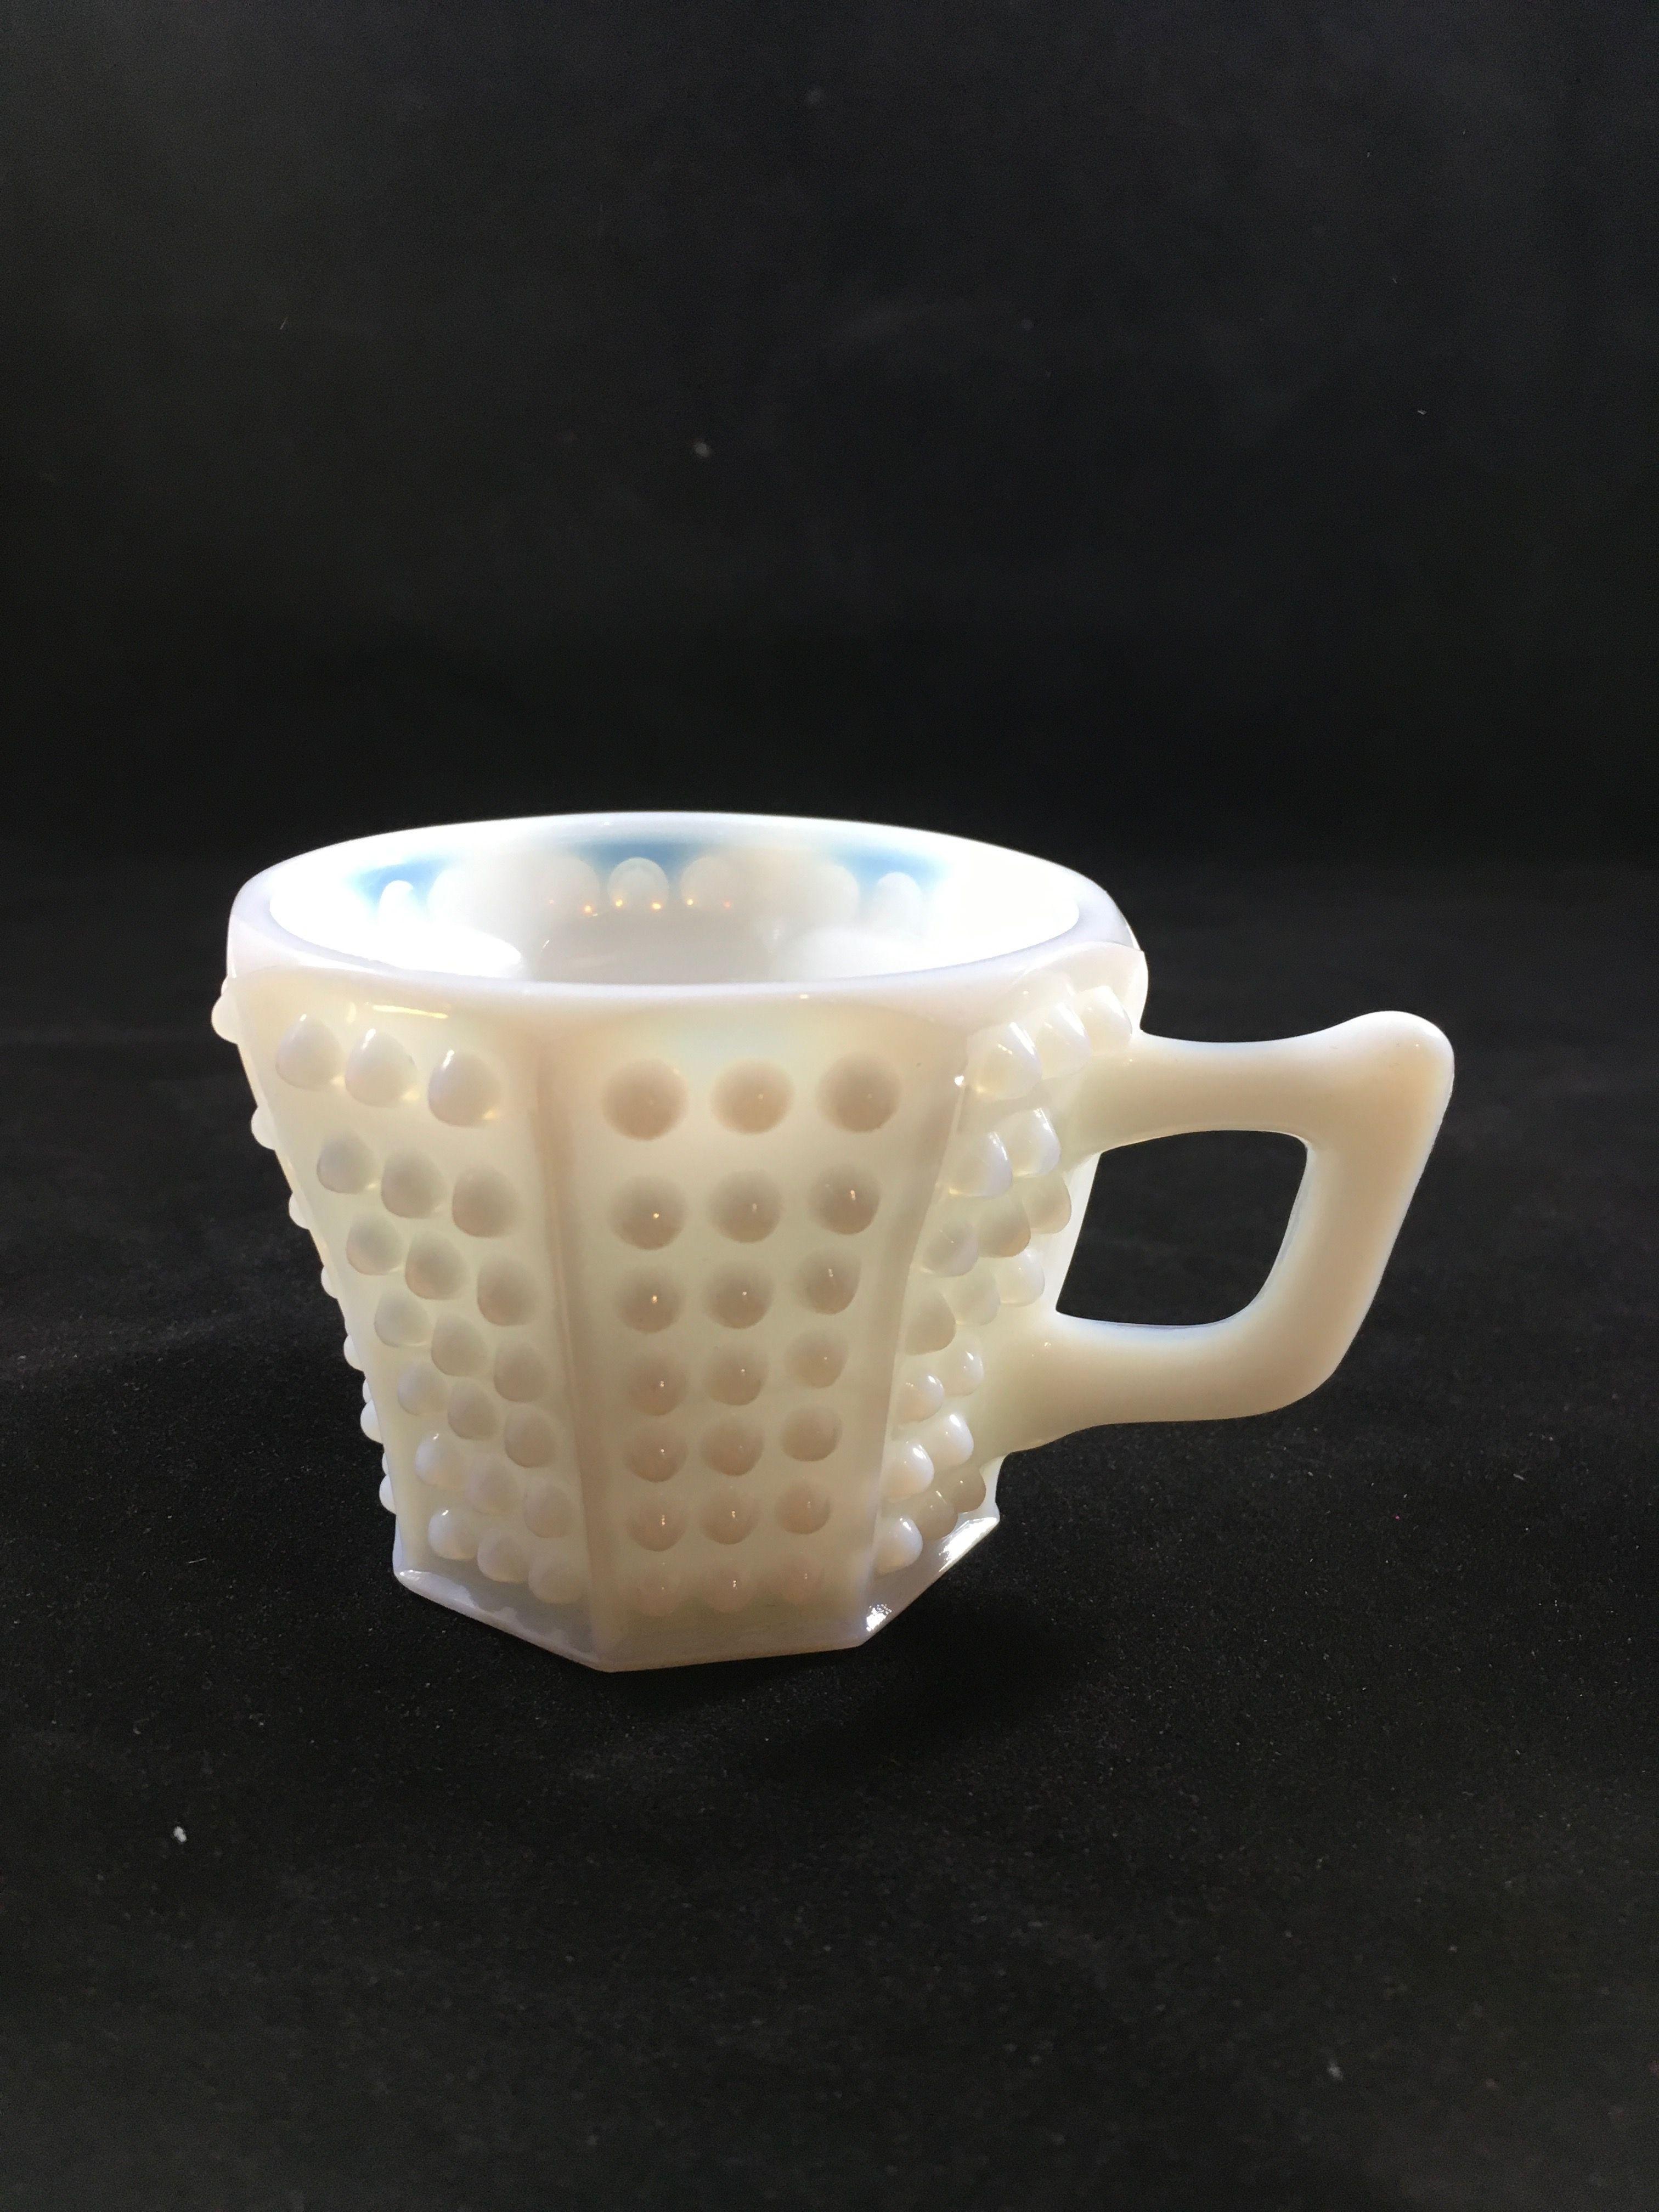 fenton rose vase of fenton 3840 hobnail milk glass punch cup 1953 1957 milk glass inside fenton 3840 hobnail milk glass punch cup 1953 1957